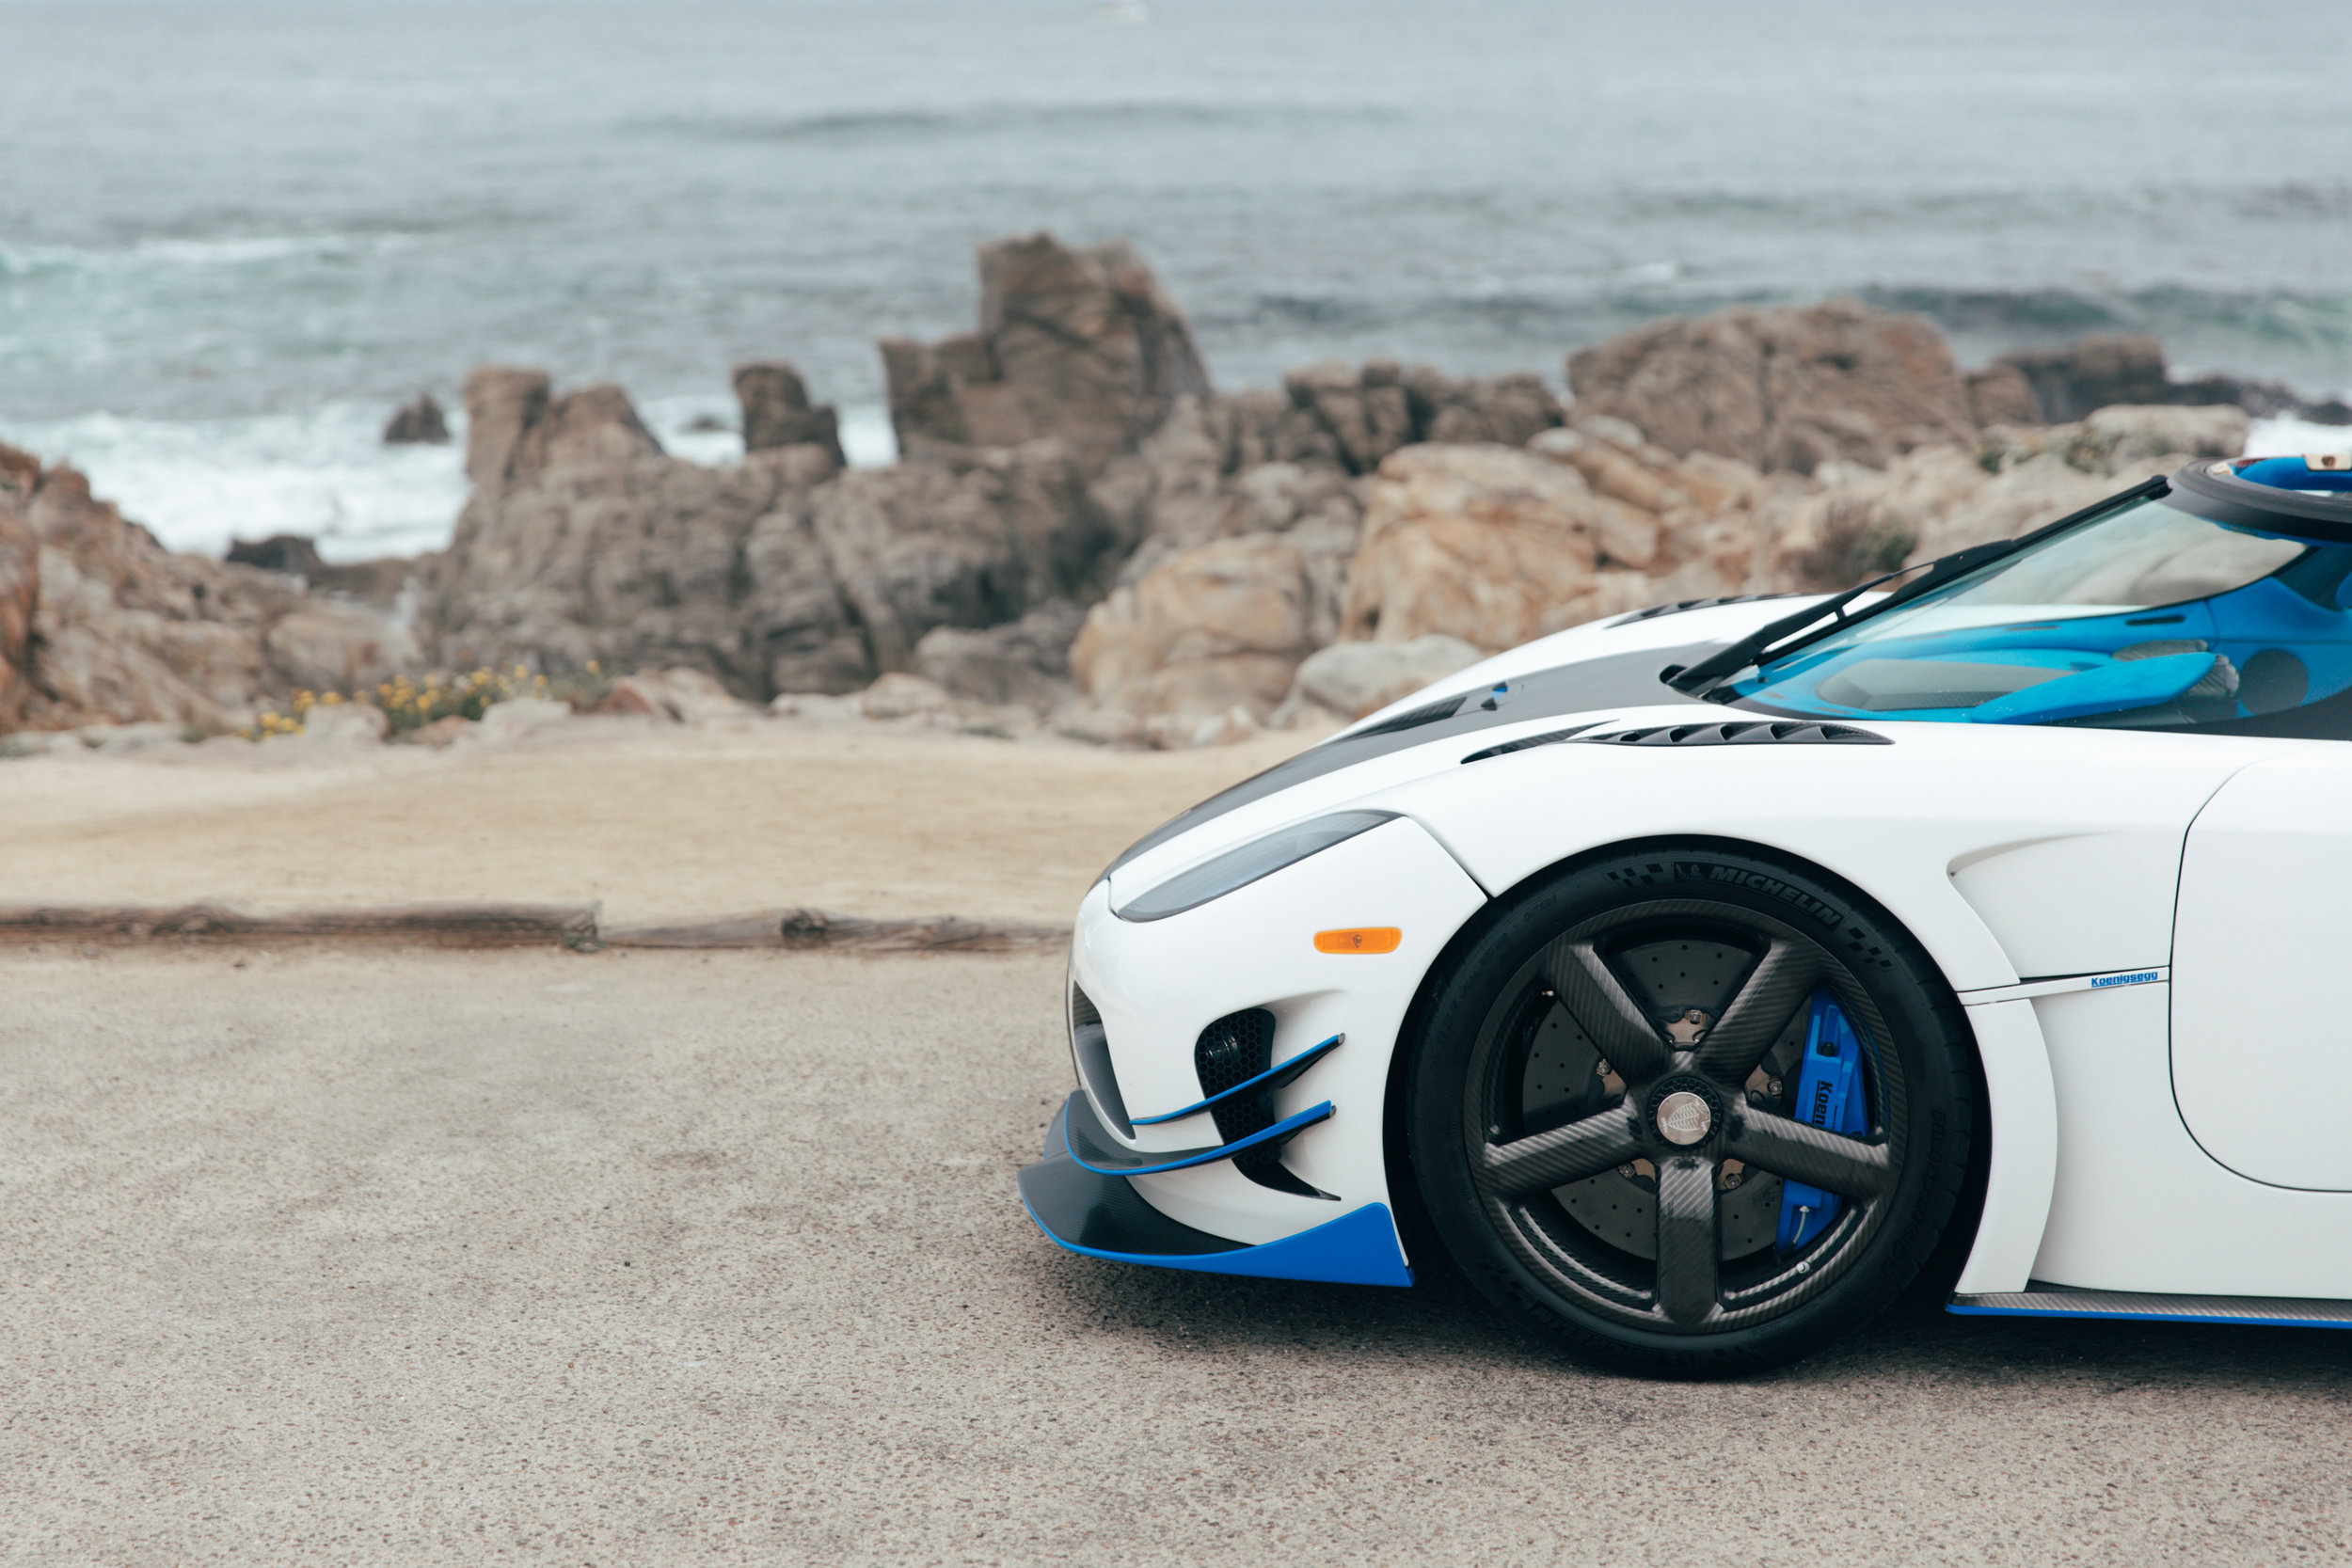 Stay_Driven_Monterey_Car_Week_Whitesse_Koenigsegg-30.jpg